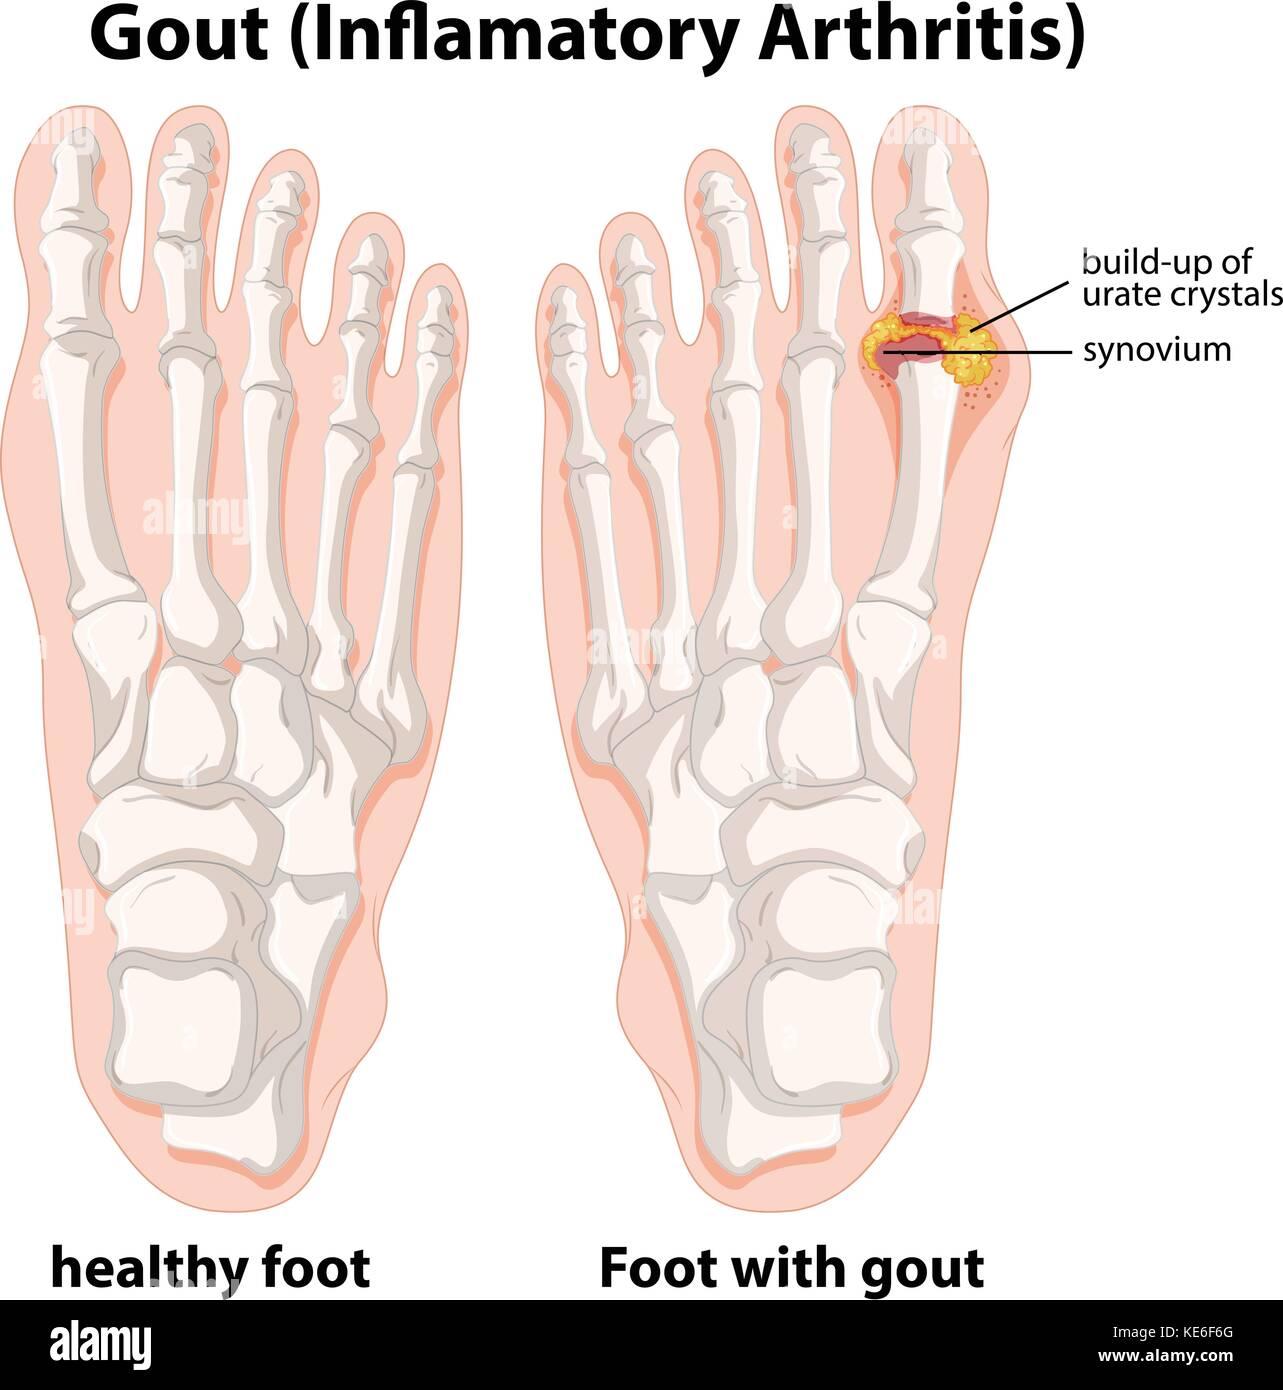 Gout Foot Imágenes De Stock & Gout Foot Fotos De Stock - Alamy